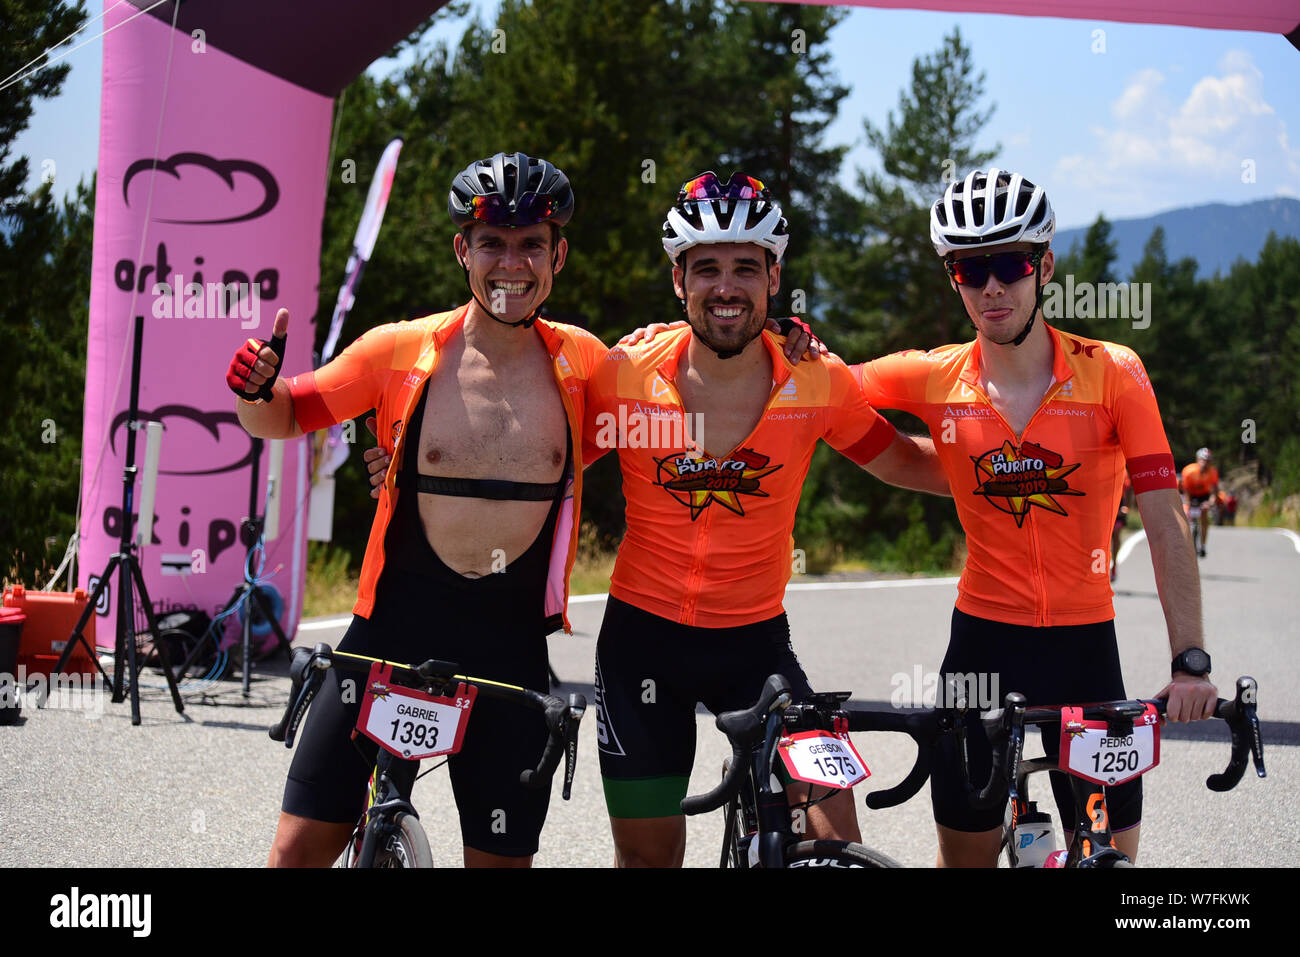 Coll de l Gallina, Sant Julia de Loria, Andorra : Agust 4 2019 : Cyclists in La Purito 2019 in Andorra. Amateur race in Andorra. Stock Photo